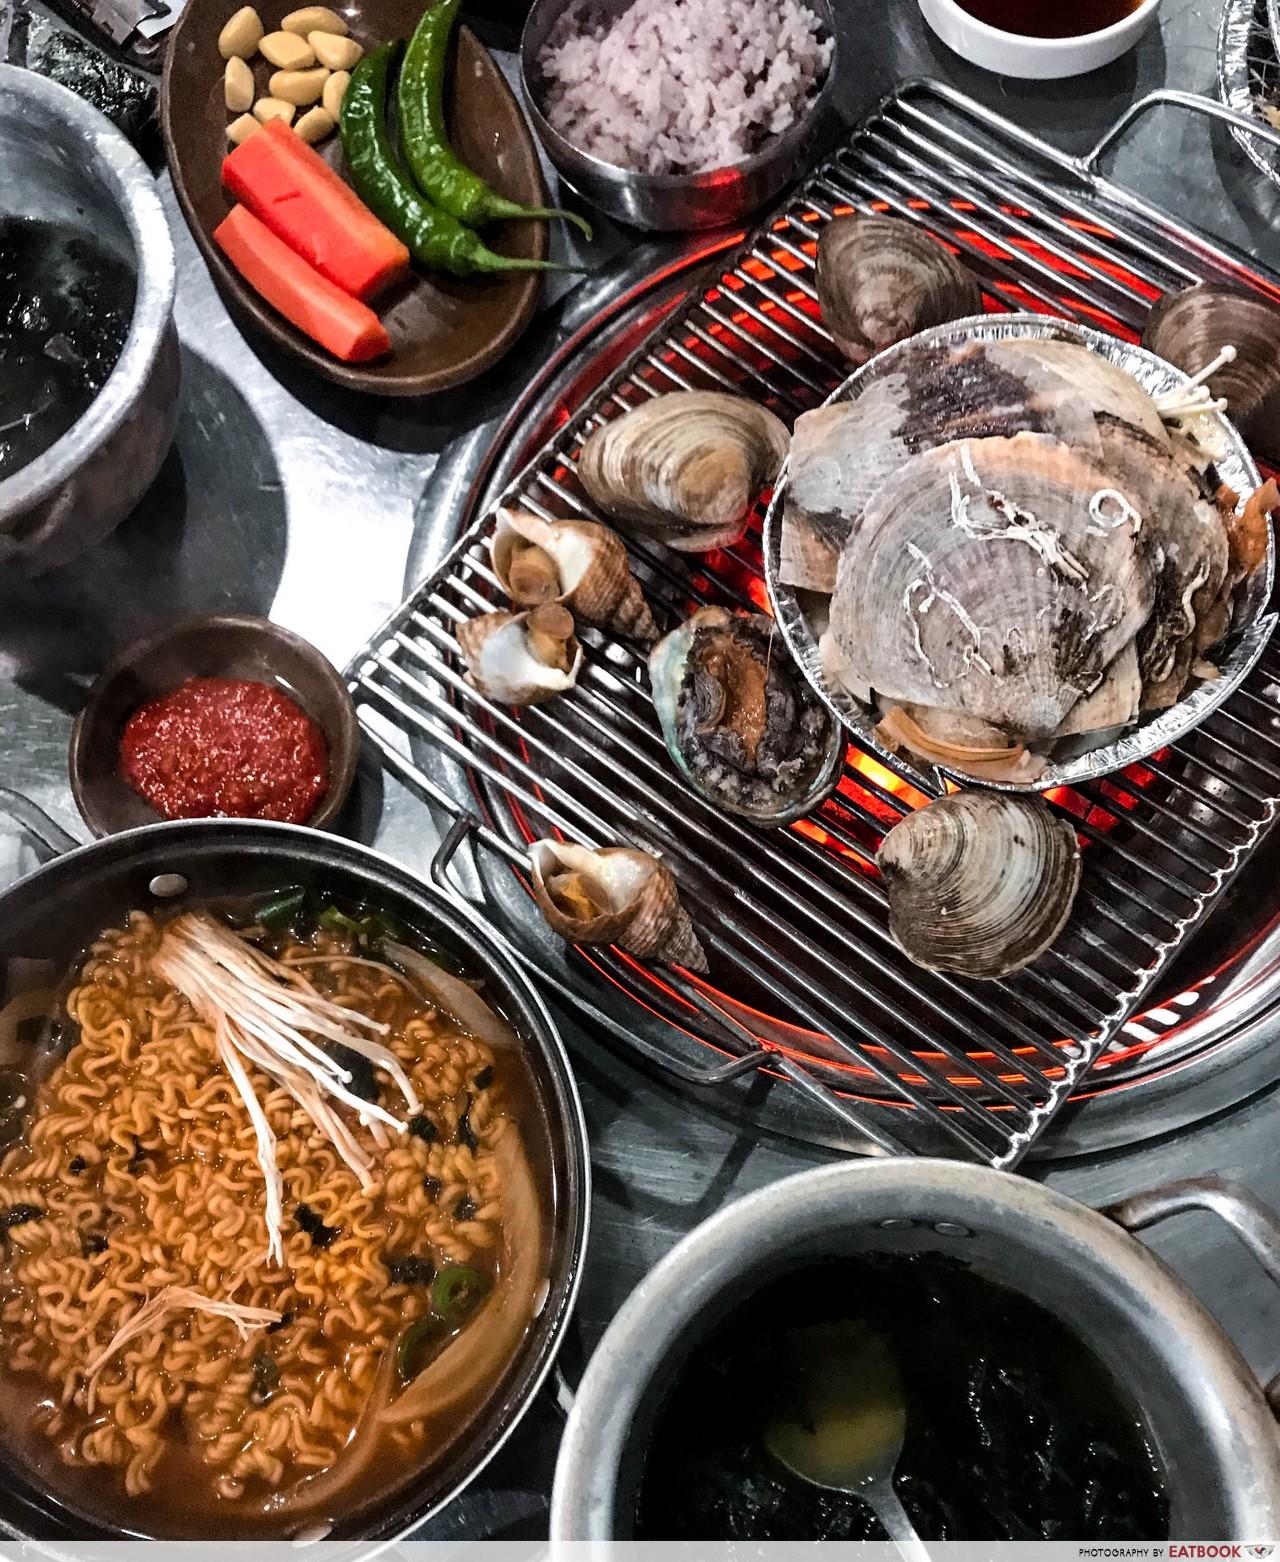 Halal Food places In Seoul - Cheongsapo Suminine